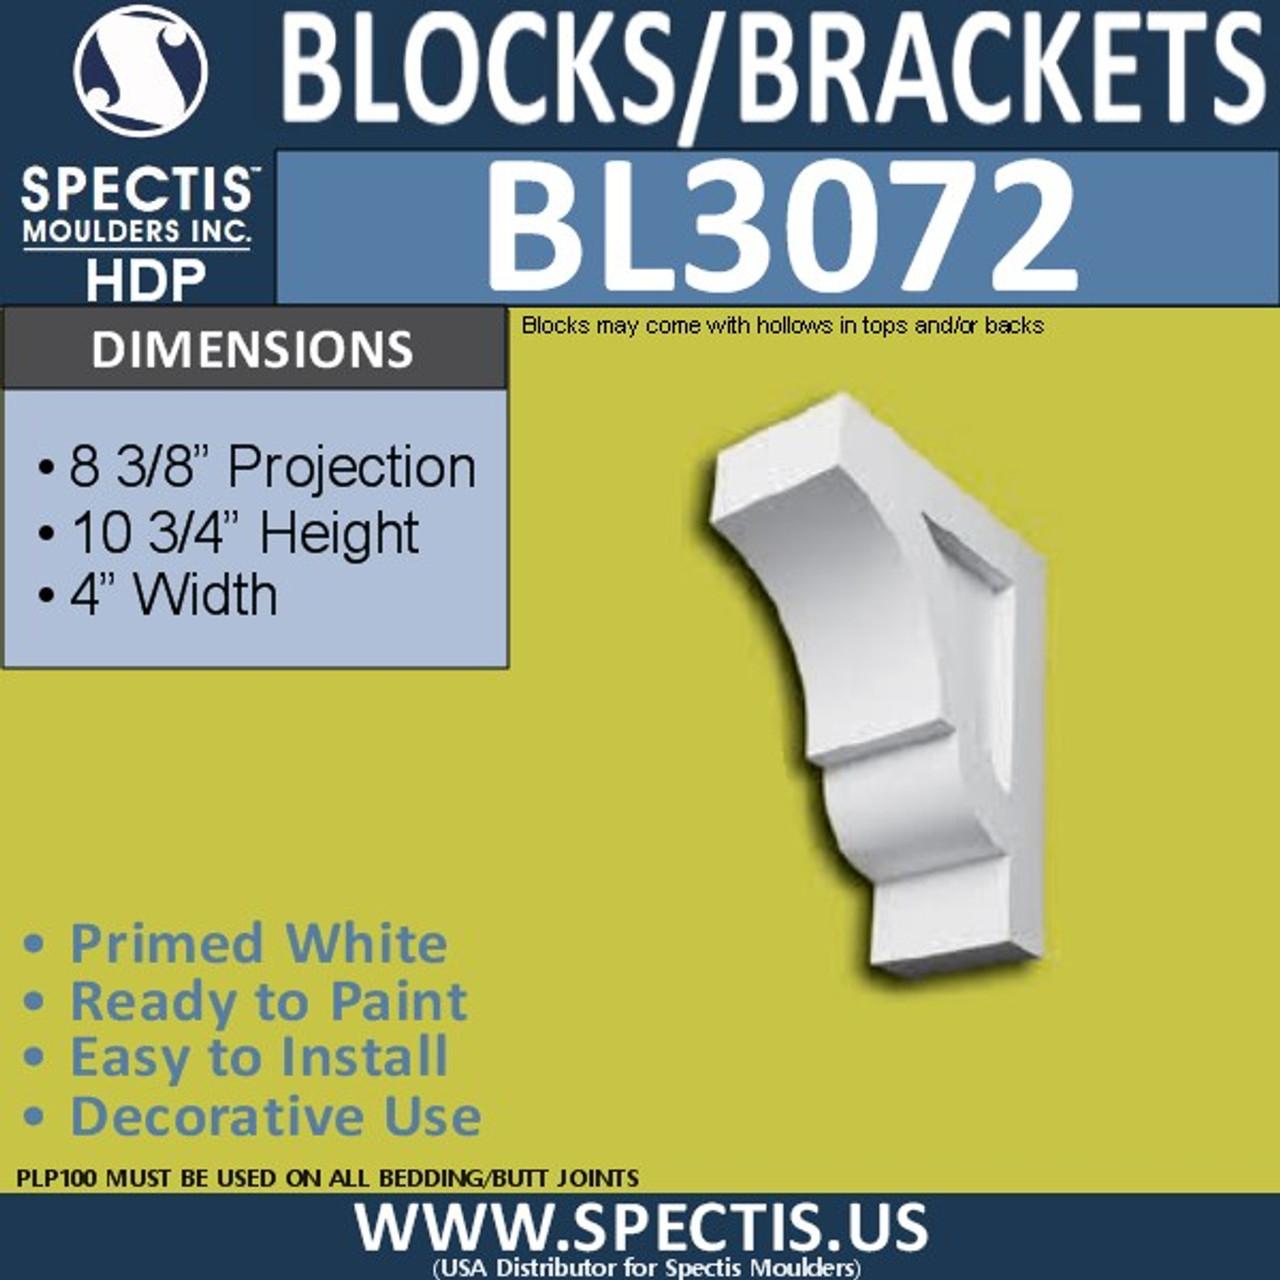 "BL3072 Eave Block or Bracket 10.75""W x 8.2""H x 10.75"" P"